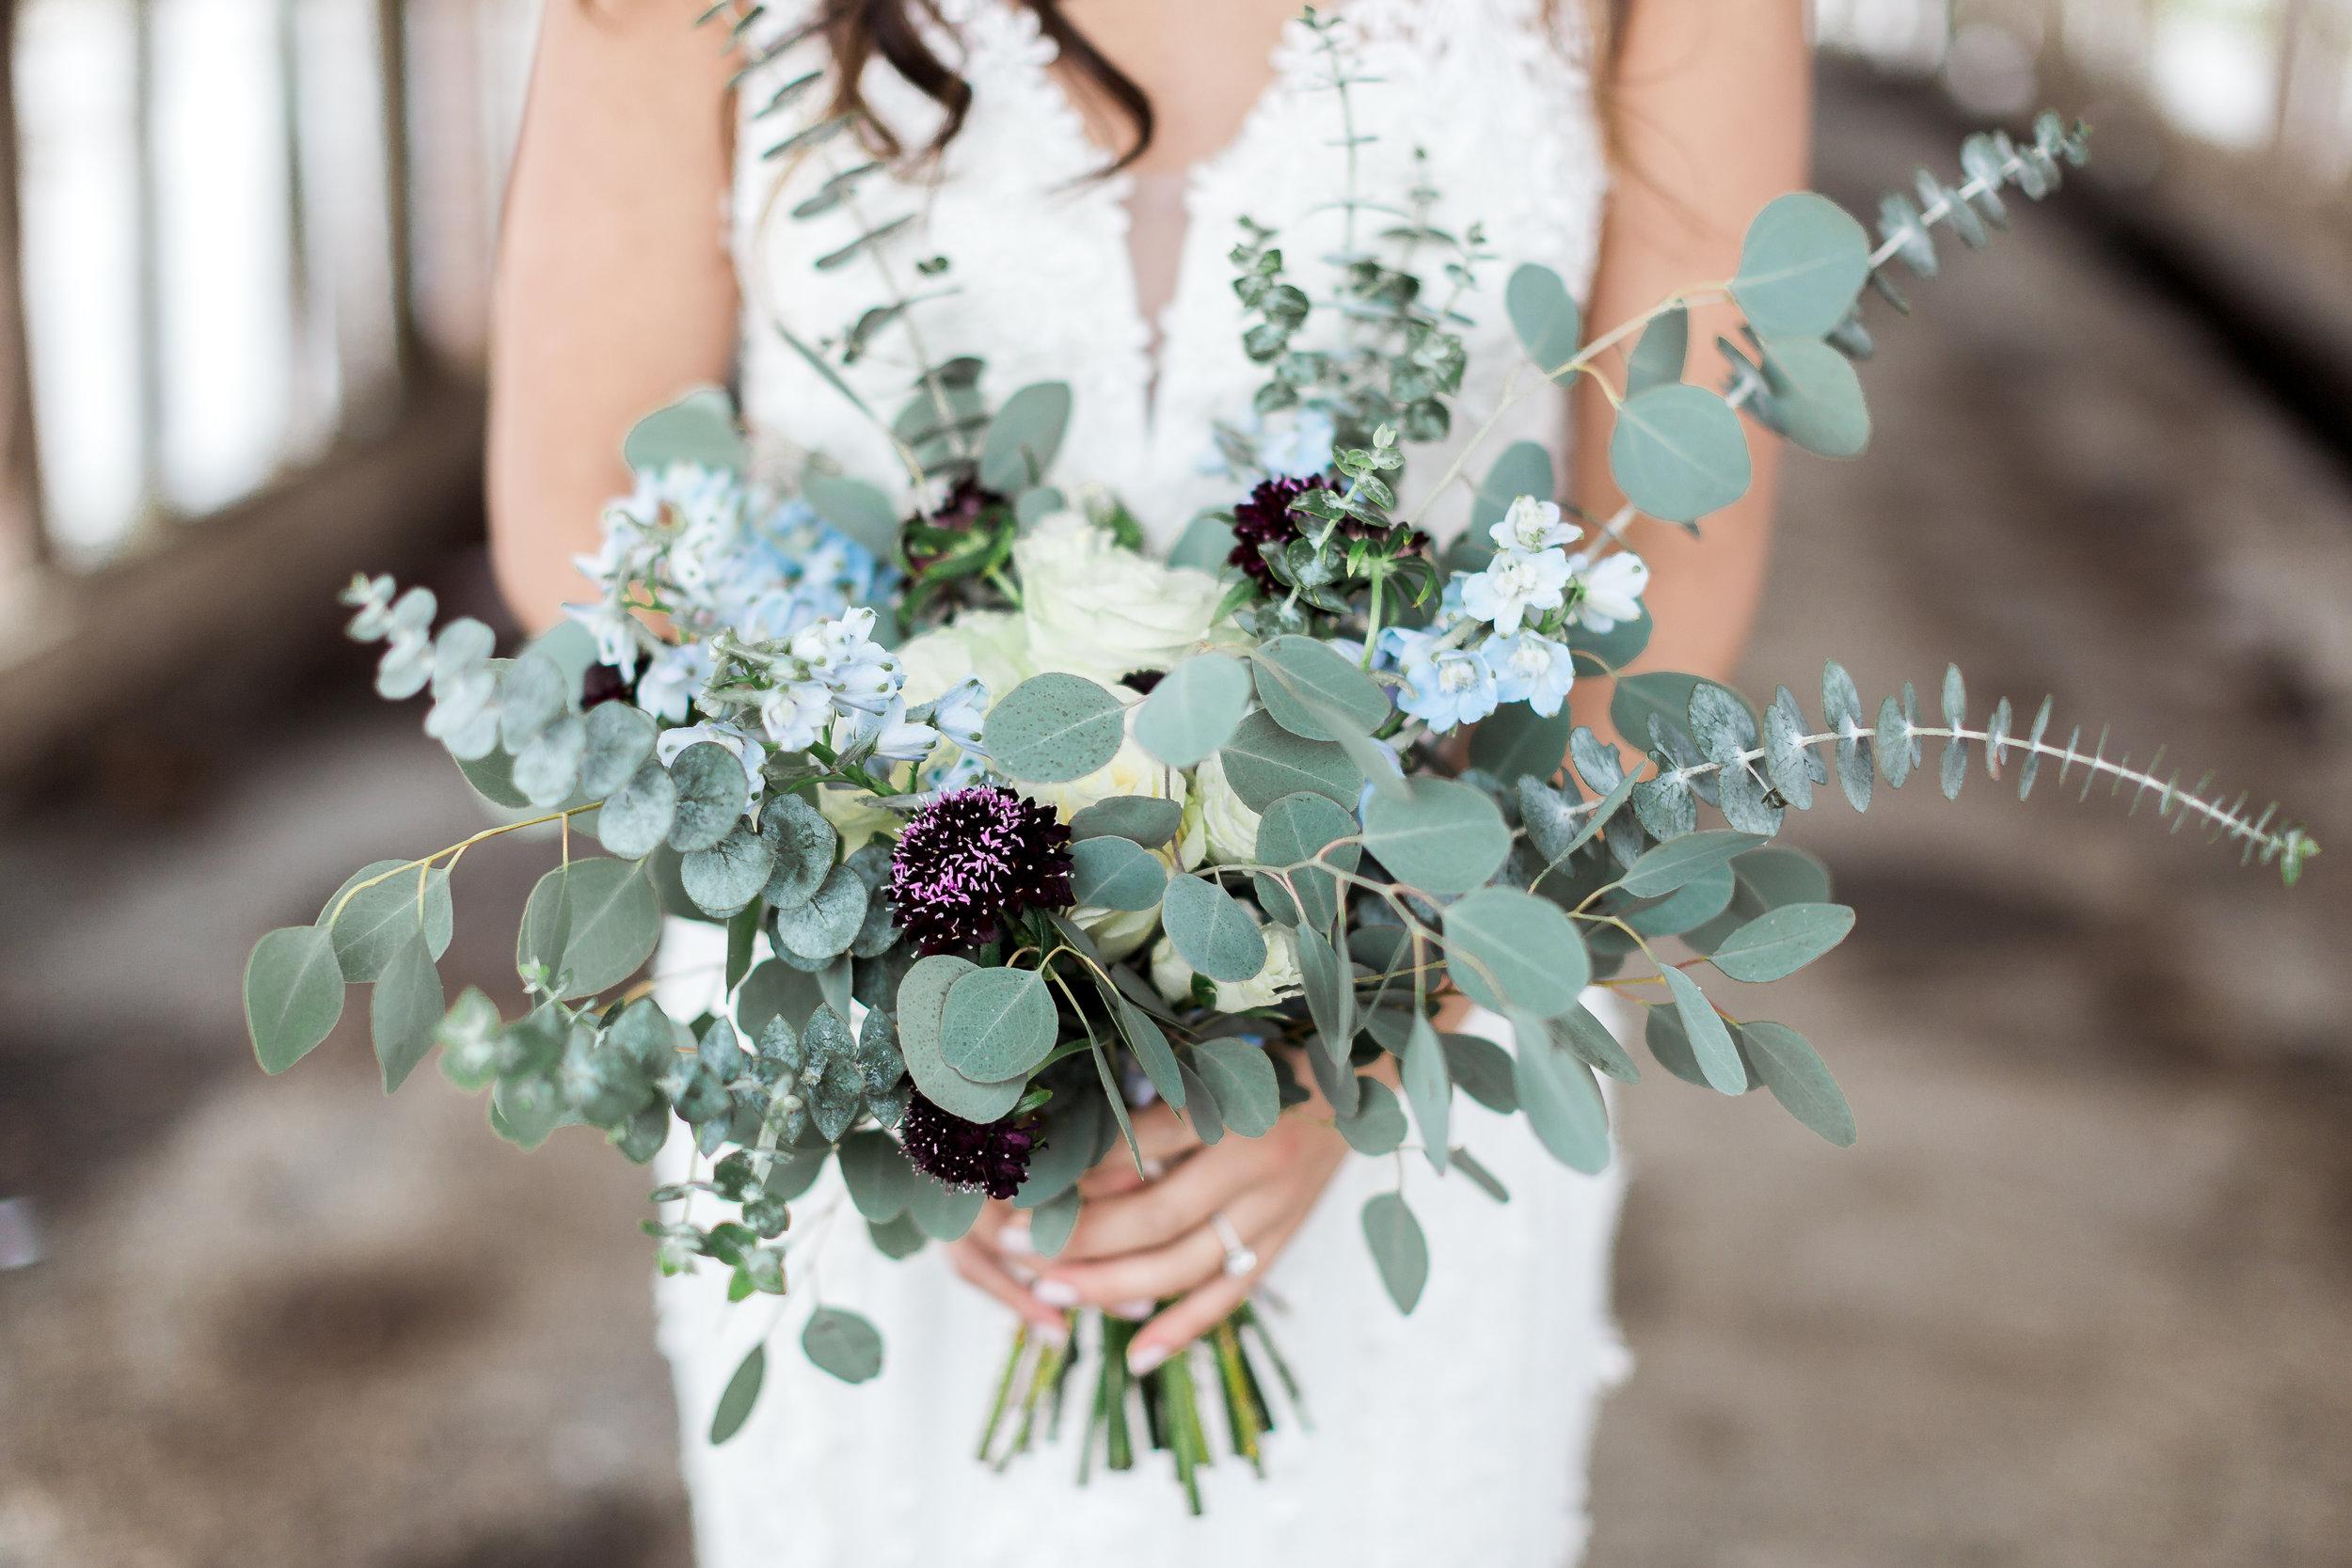 AlessandraArendtPhotography_Copyright2016_Chris-and-Deena_Wedding_HighResolution-282.jpg